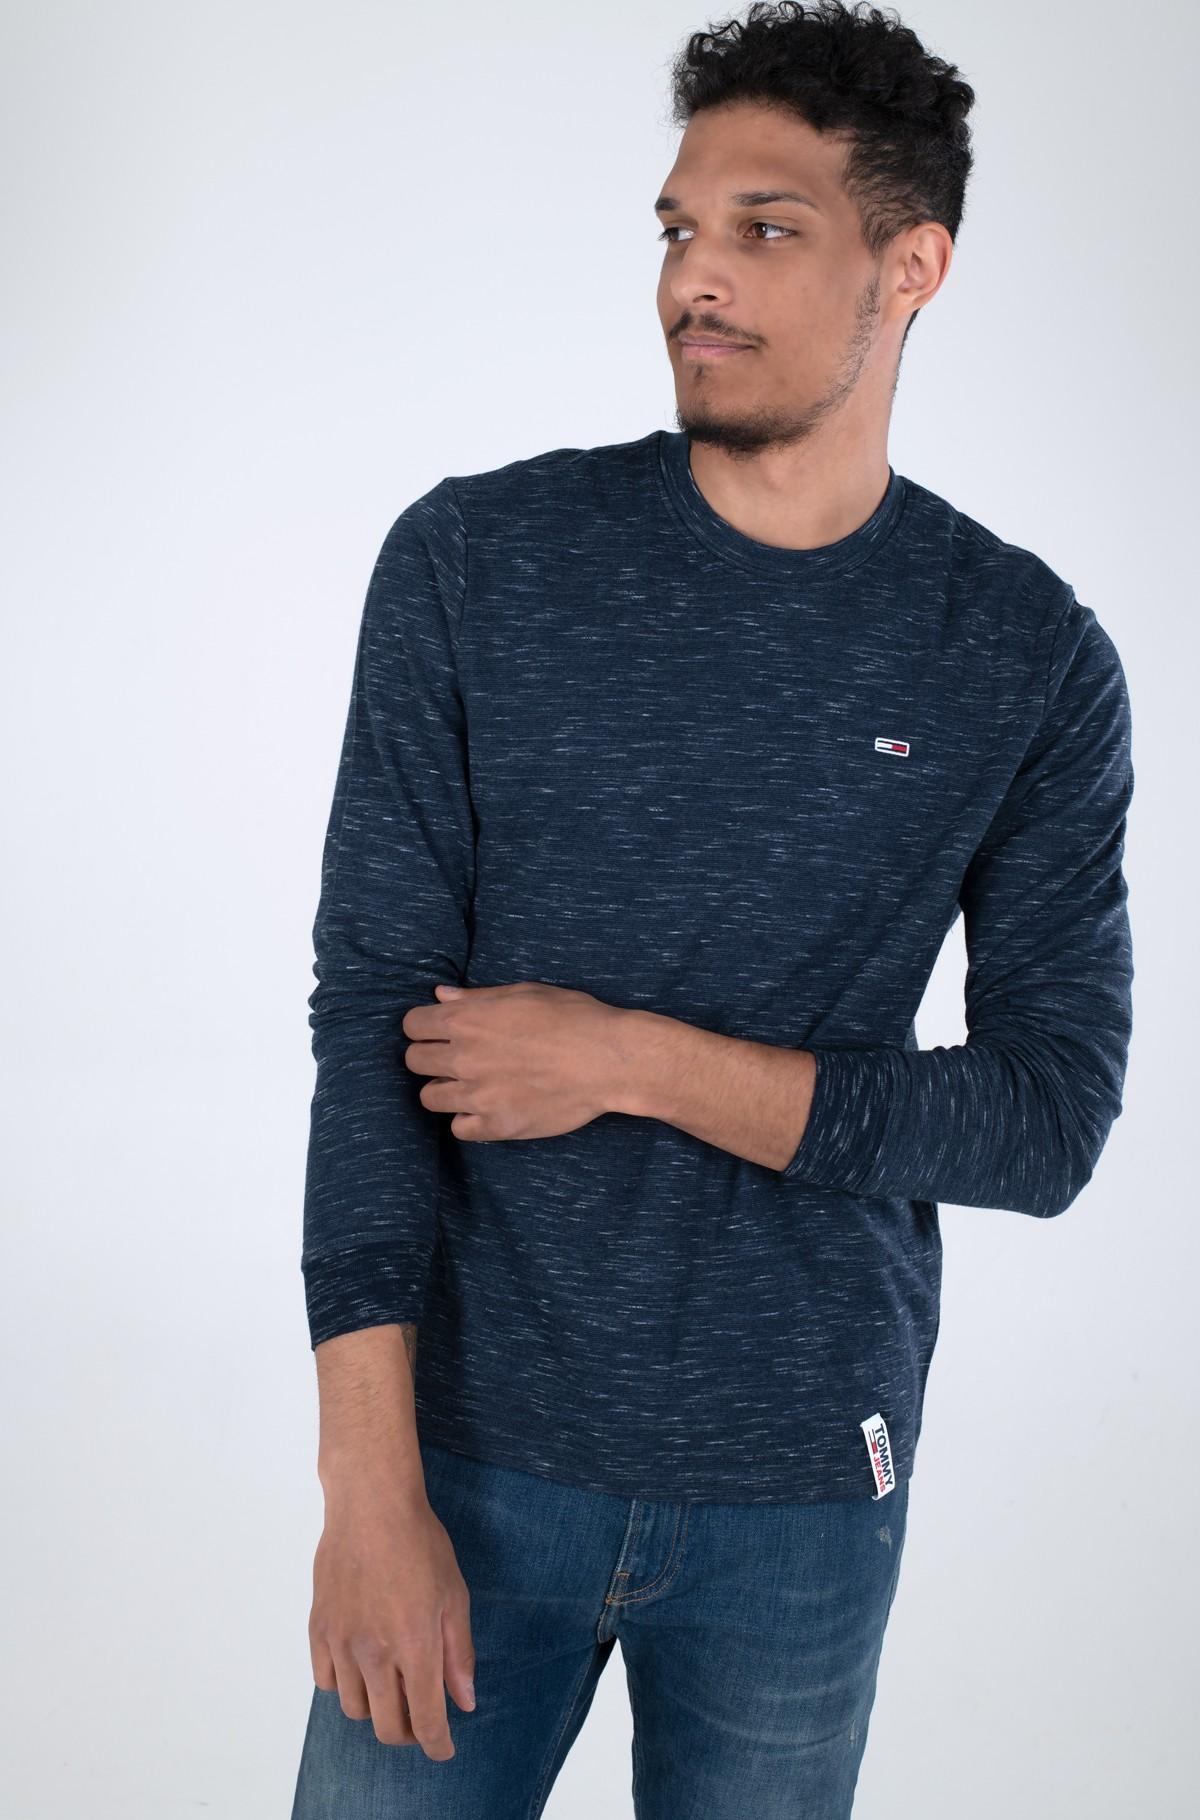 T-krekls ar garām piedurknēm  TJM CREW NECK SNIT-full-1